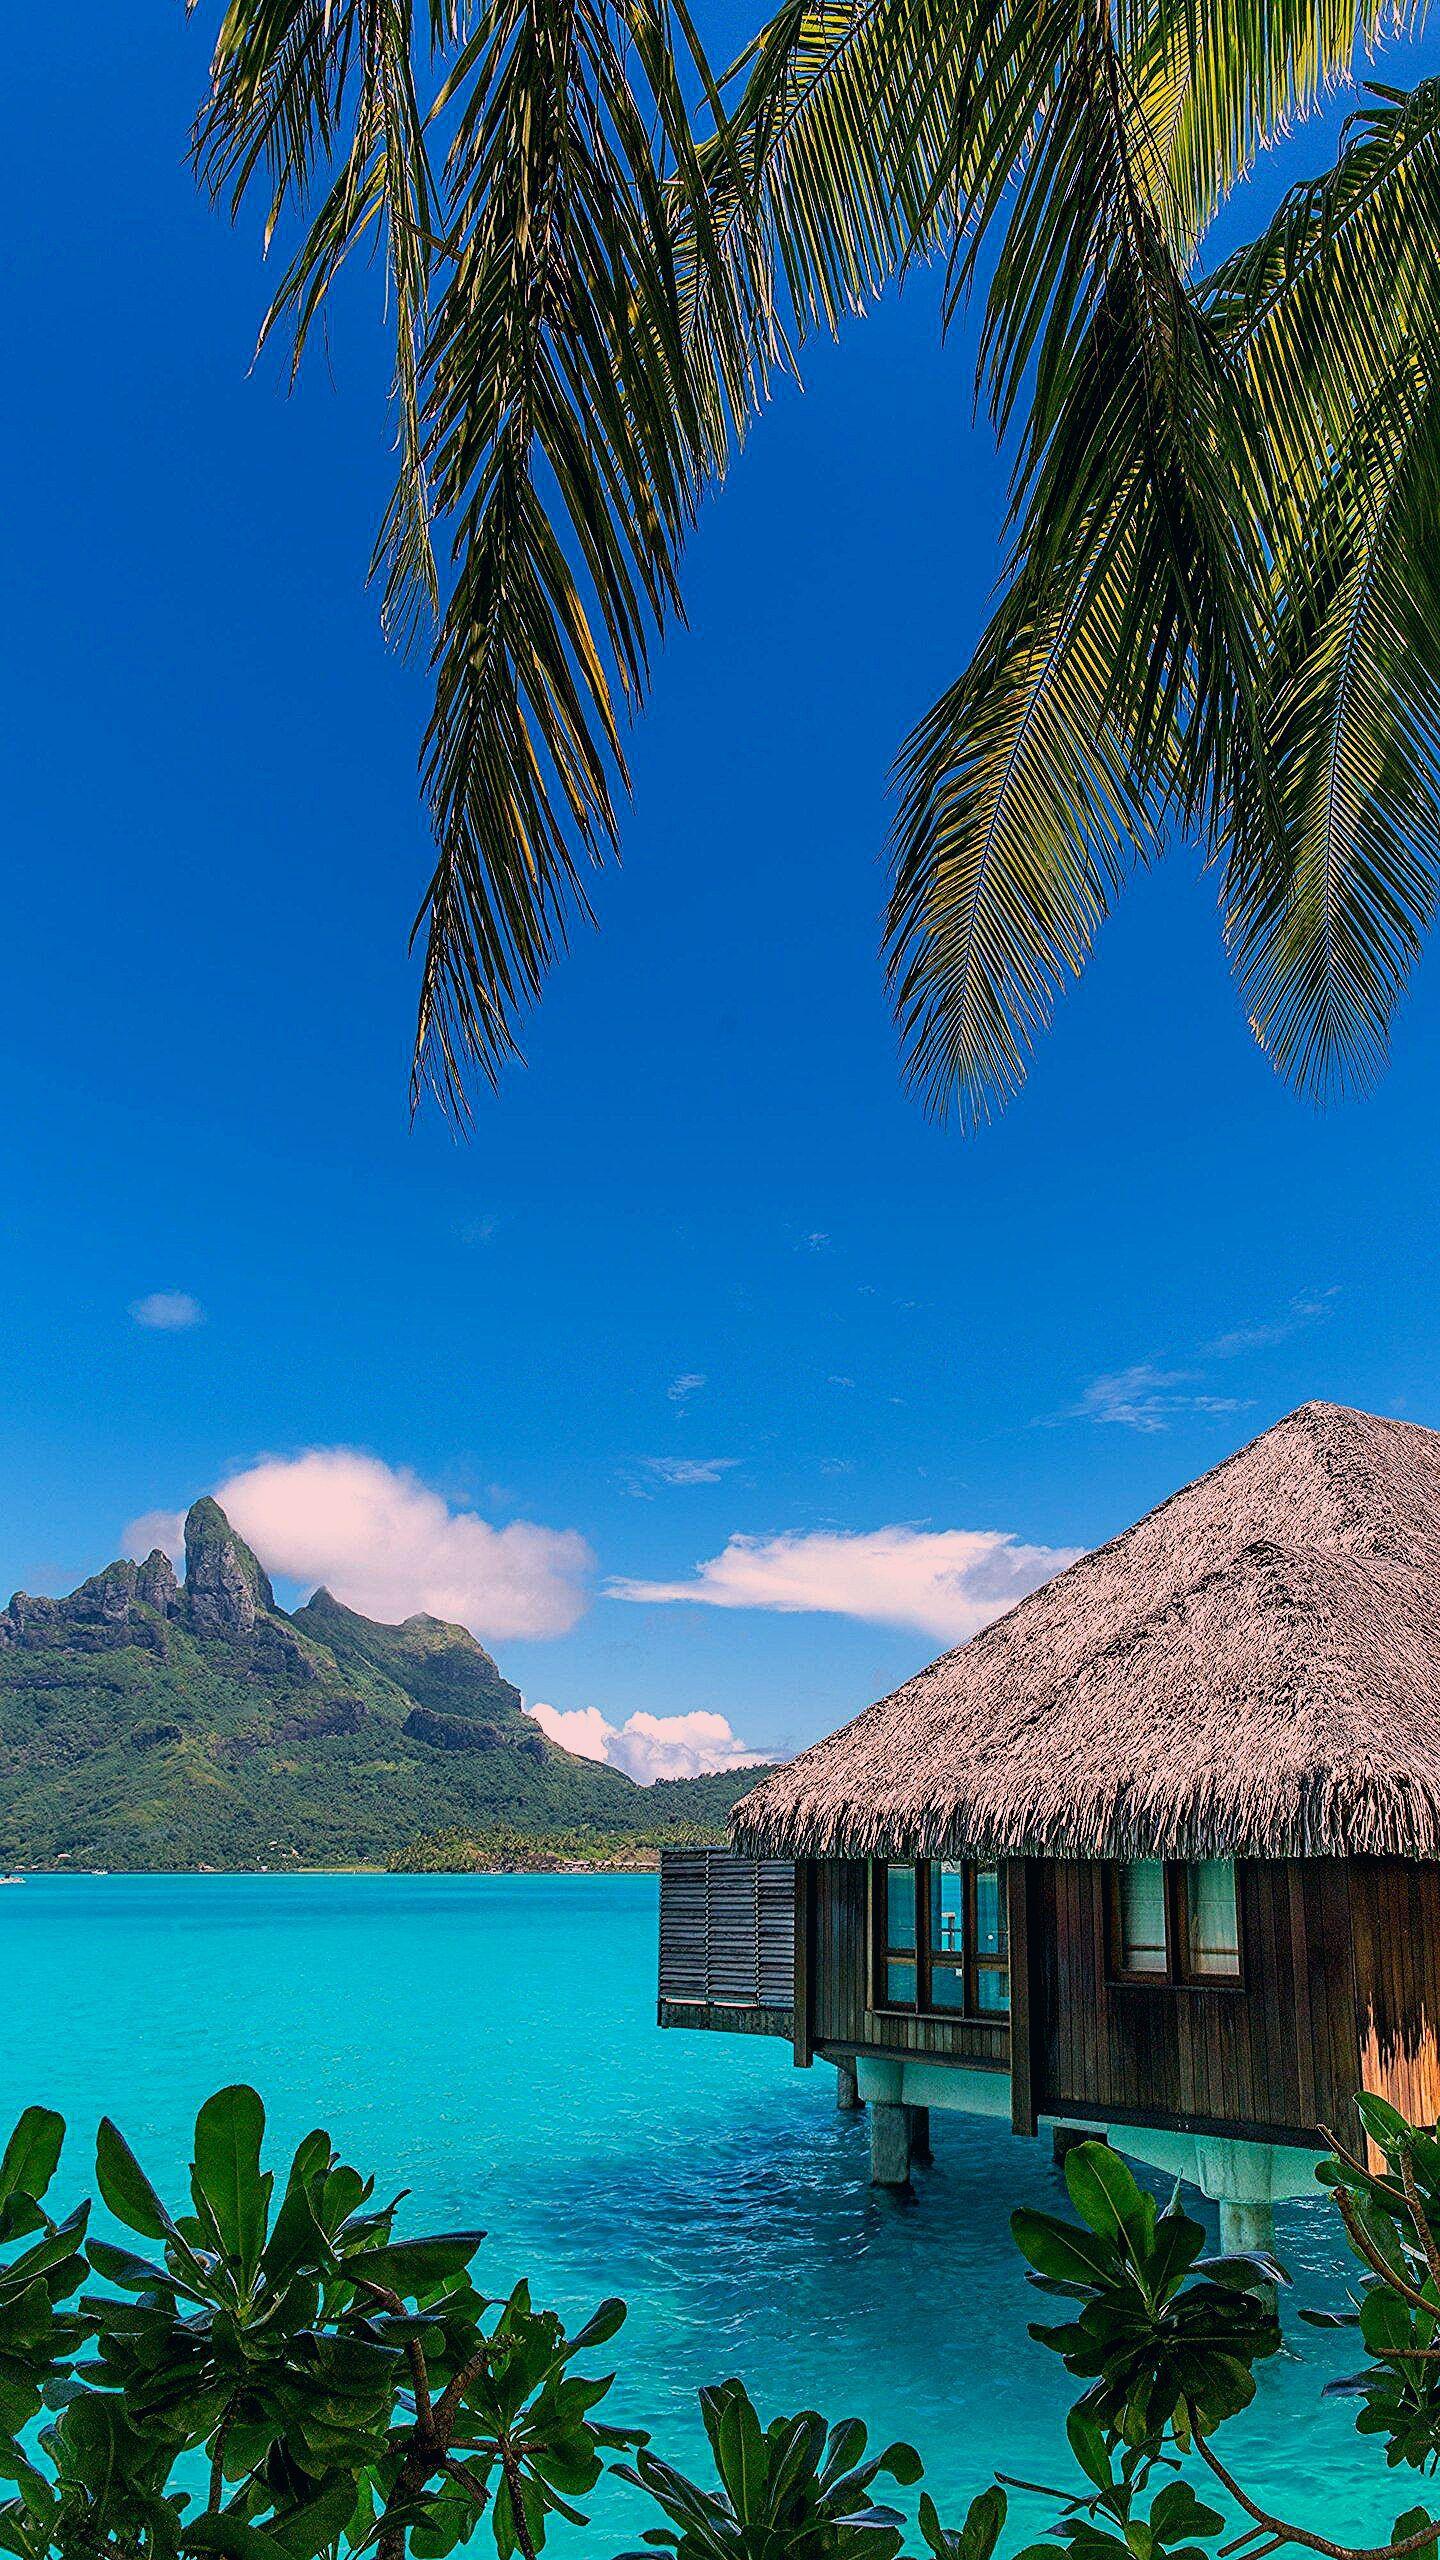 Photo of Honeymoon inspo: The St. Regis Bora Bora Resort